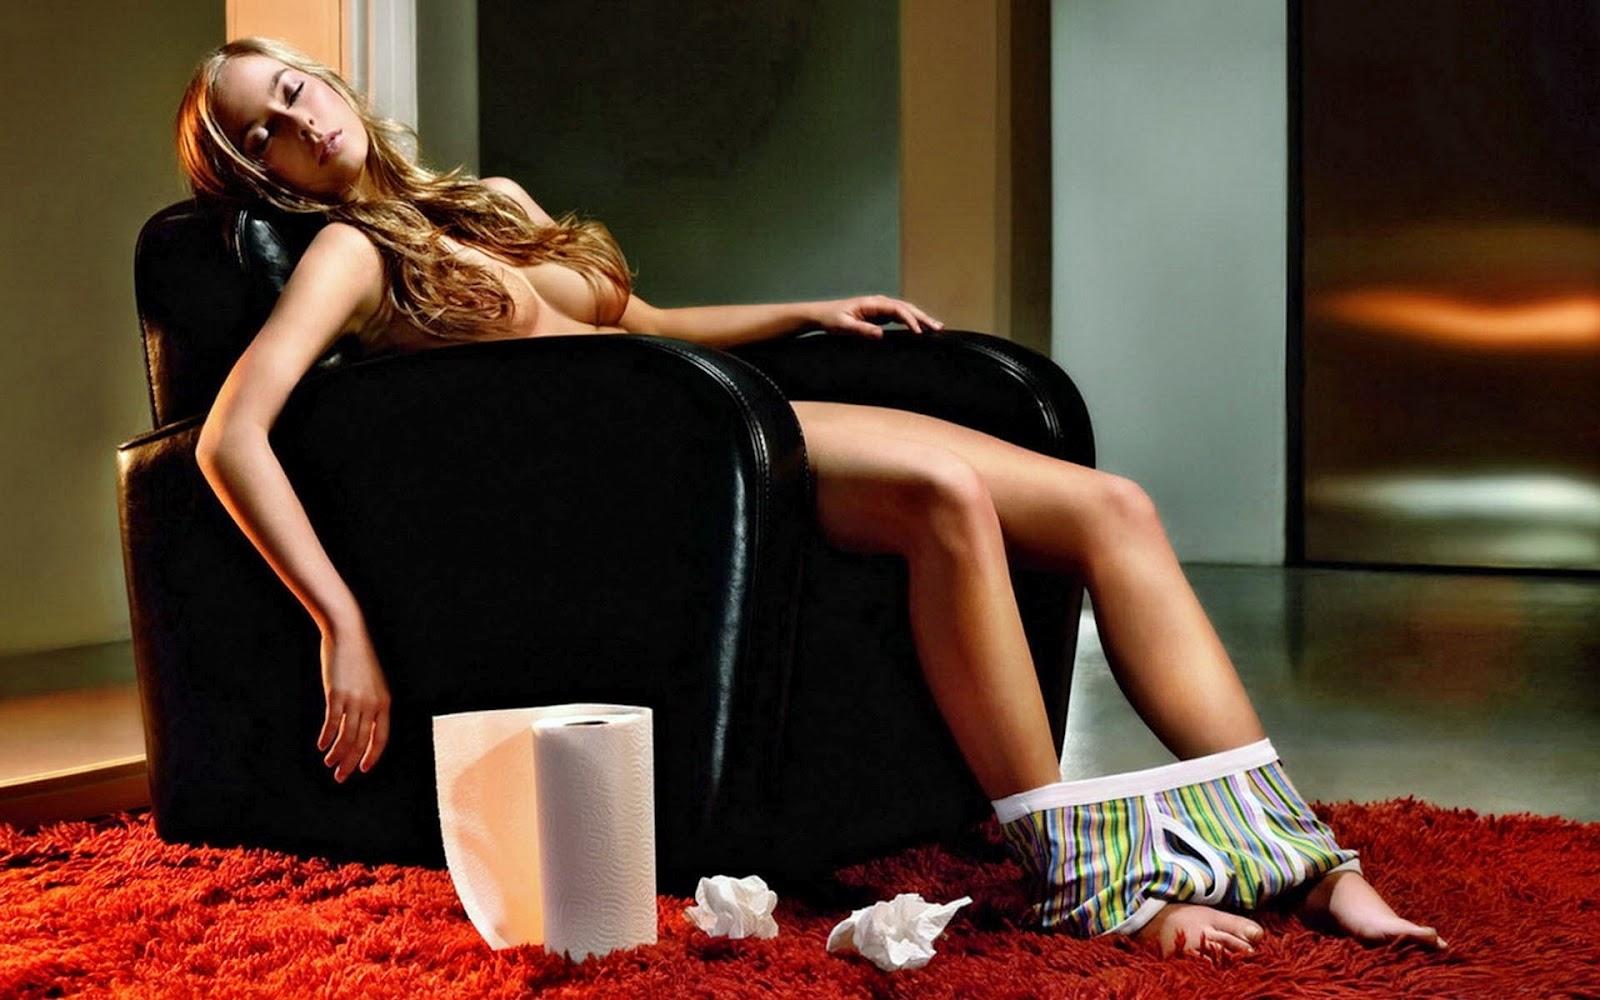 http://1.bp.blogspot.com/-U47qx3BUqKM/T7hNEultRTI/AAAAAAAABzM/rB0qDW6v8DI/s1600/sexy-hot-babes-full-hd-wallpapers+(3).jpg